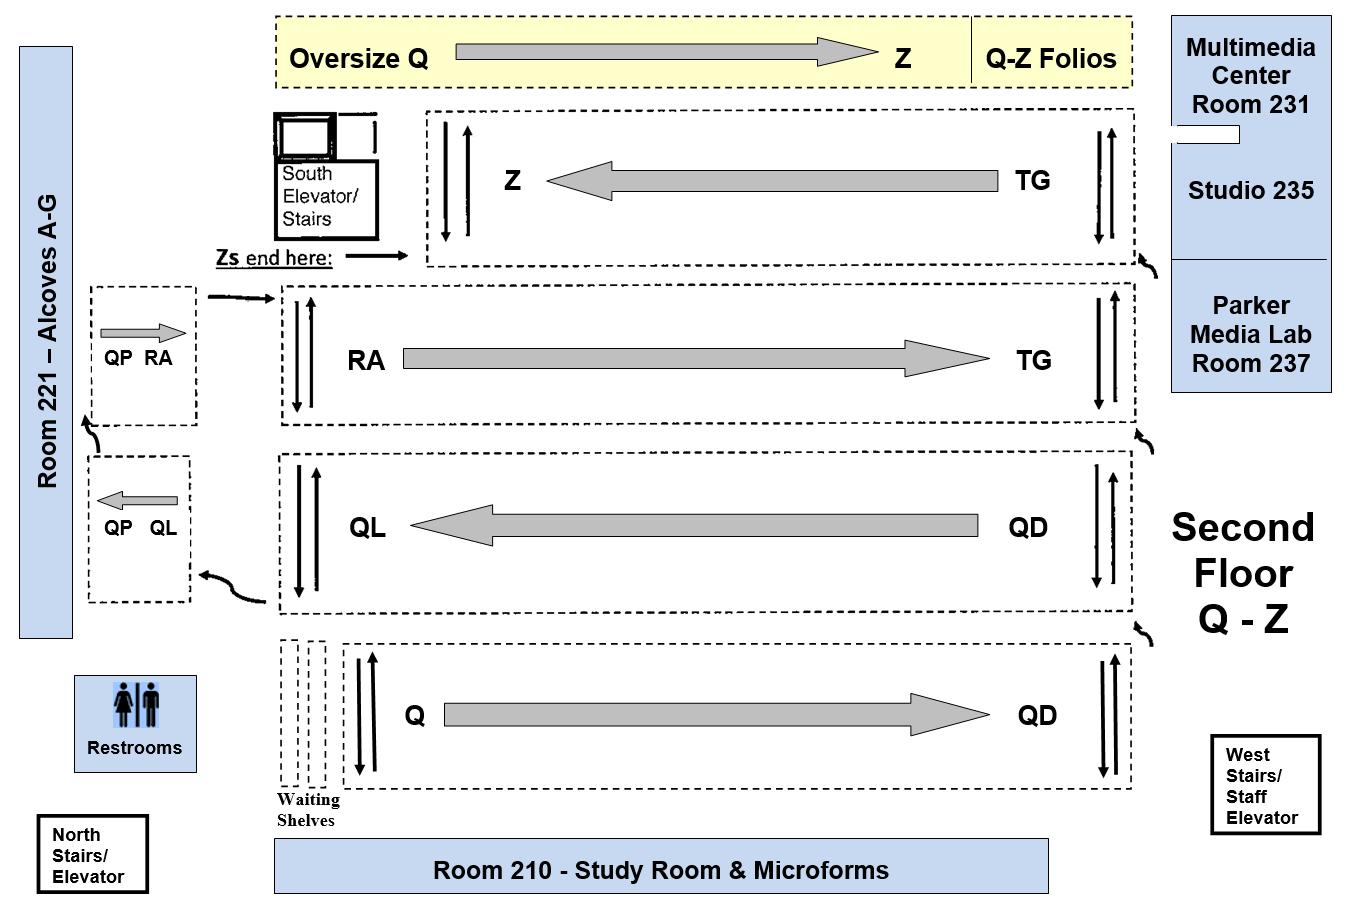 Floor map of level 2